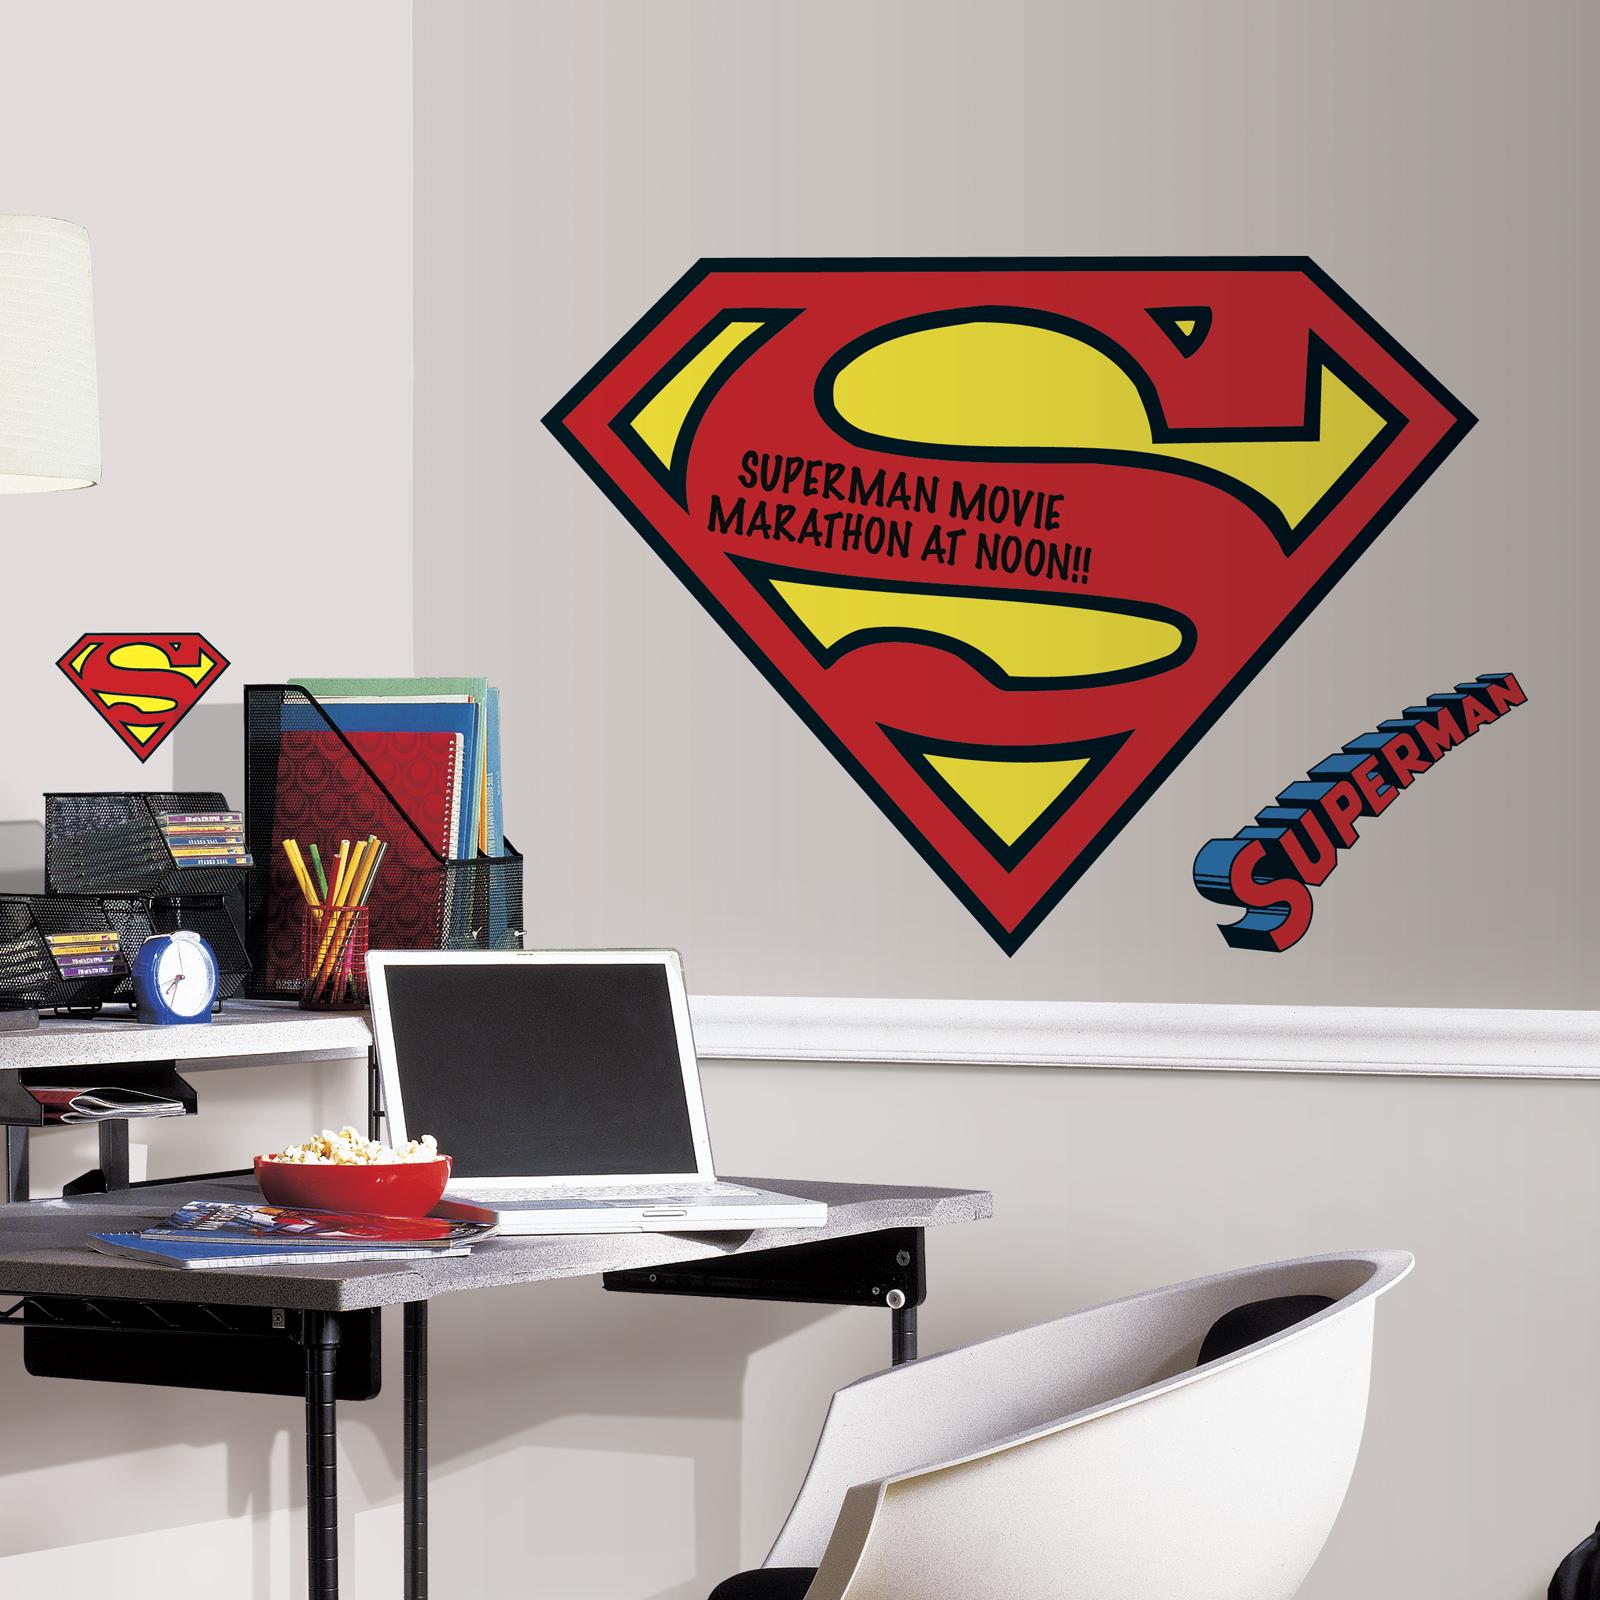 RoomMates Superman Logo Dry Erase Peel and Stick Giant Wall Decals PartNumber: 03003199000P KsnValue: 8634598 MfgPartNumber: RMK2624SLM